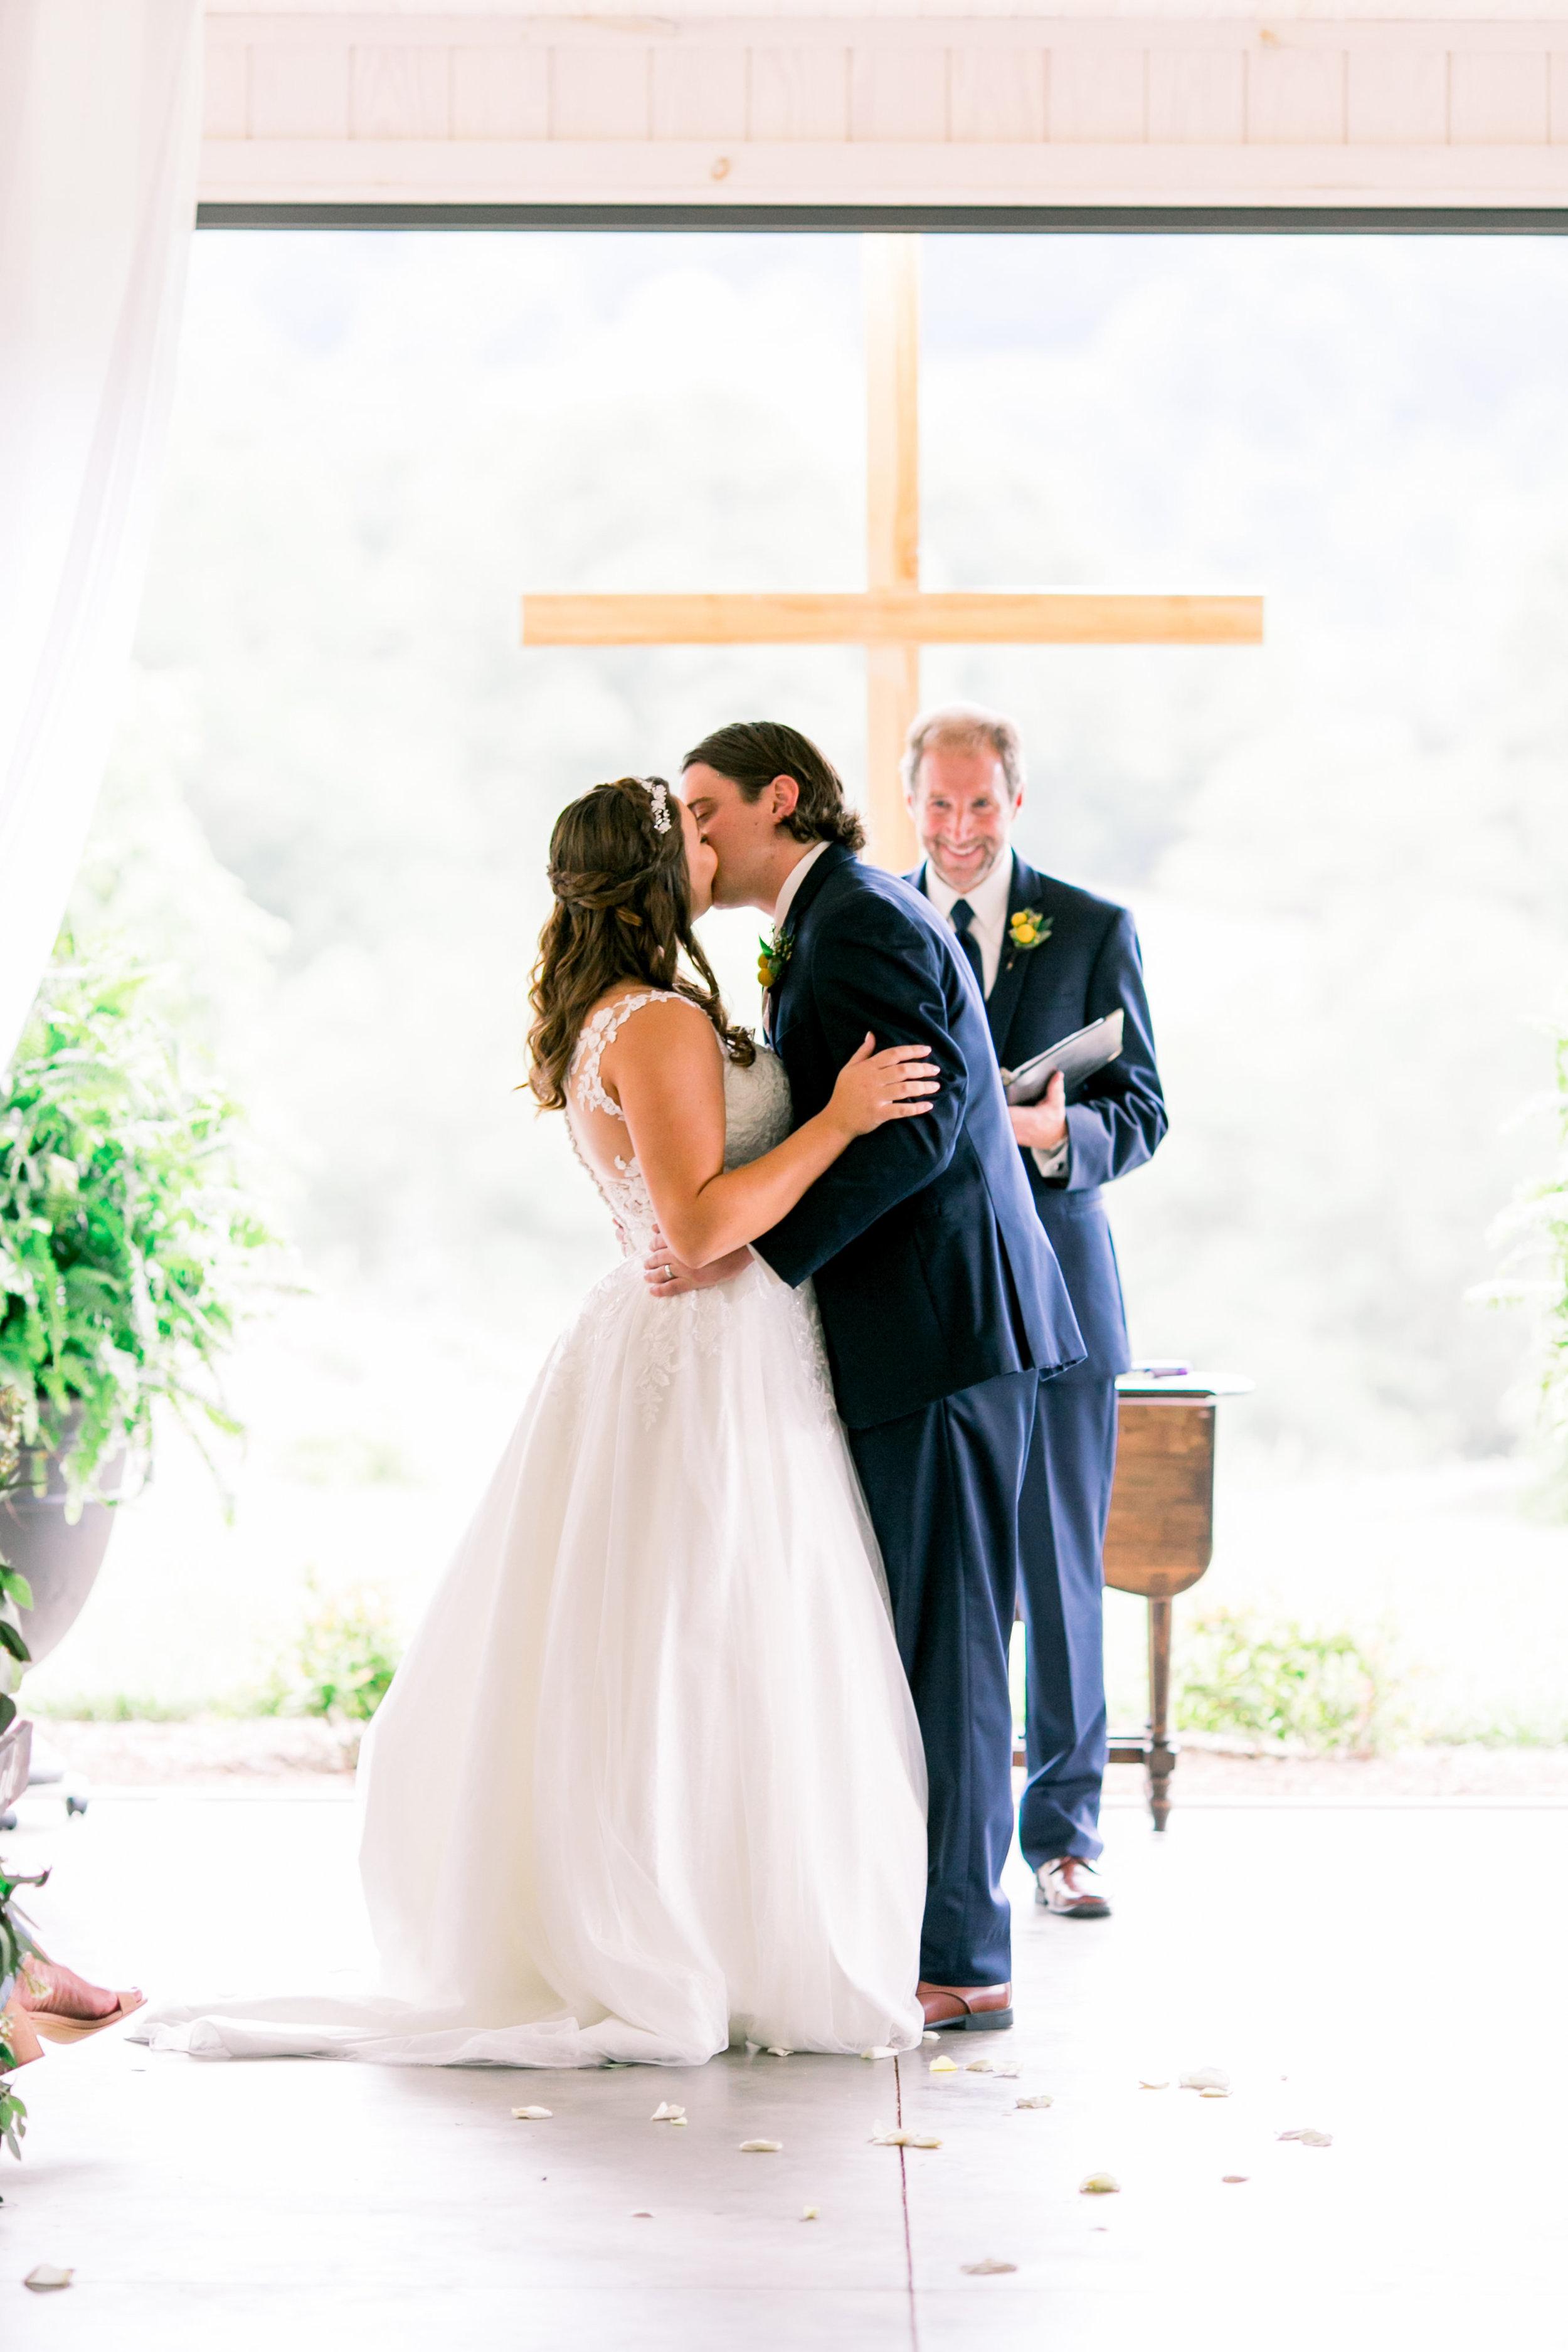 Joy-Unscripted-Wedding-Calligraphy-Kendall-10.jpg